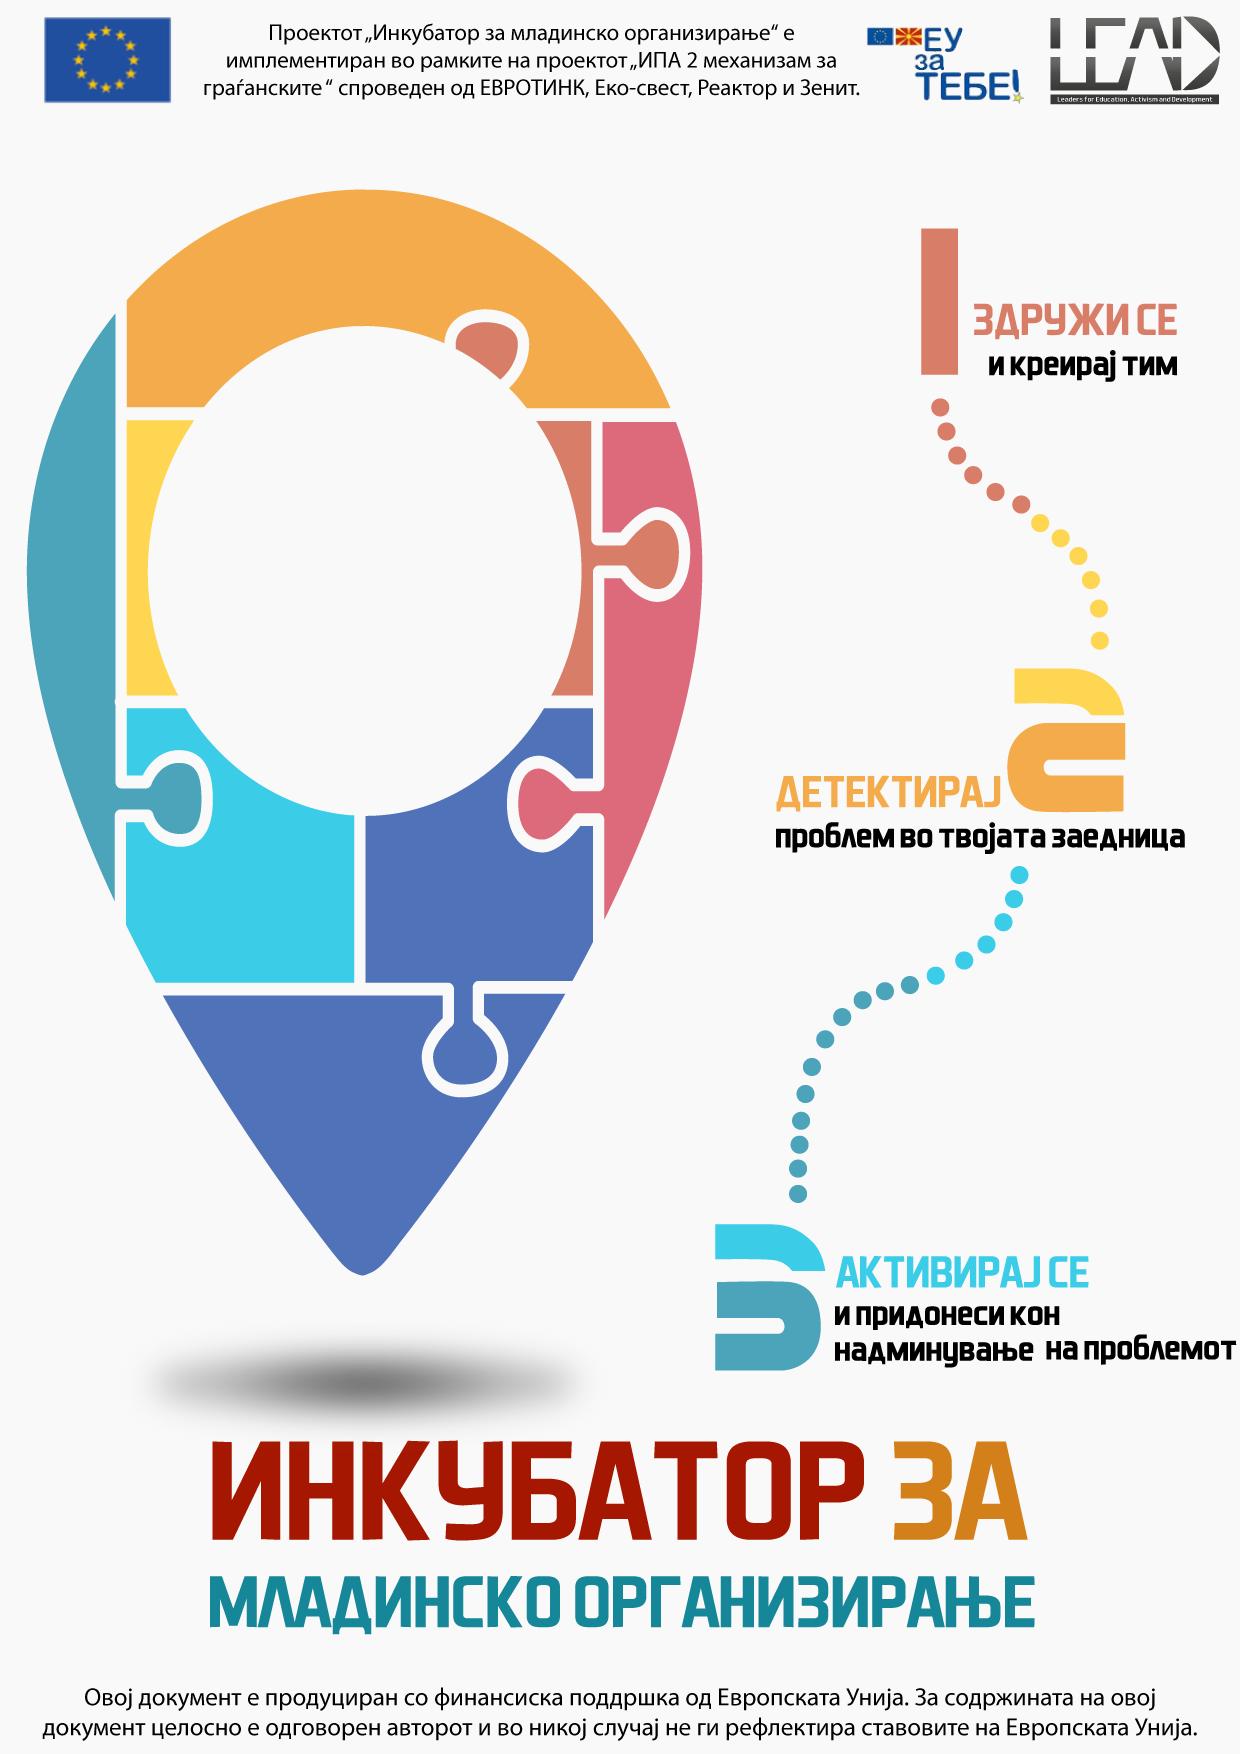 LEAD_posteri_Inkubator za mladinsko organiziranje-01